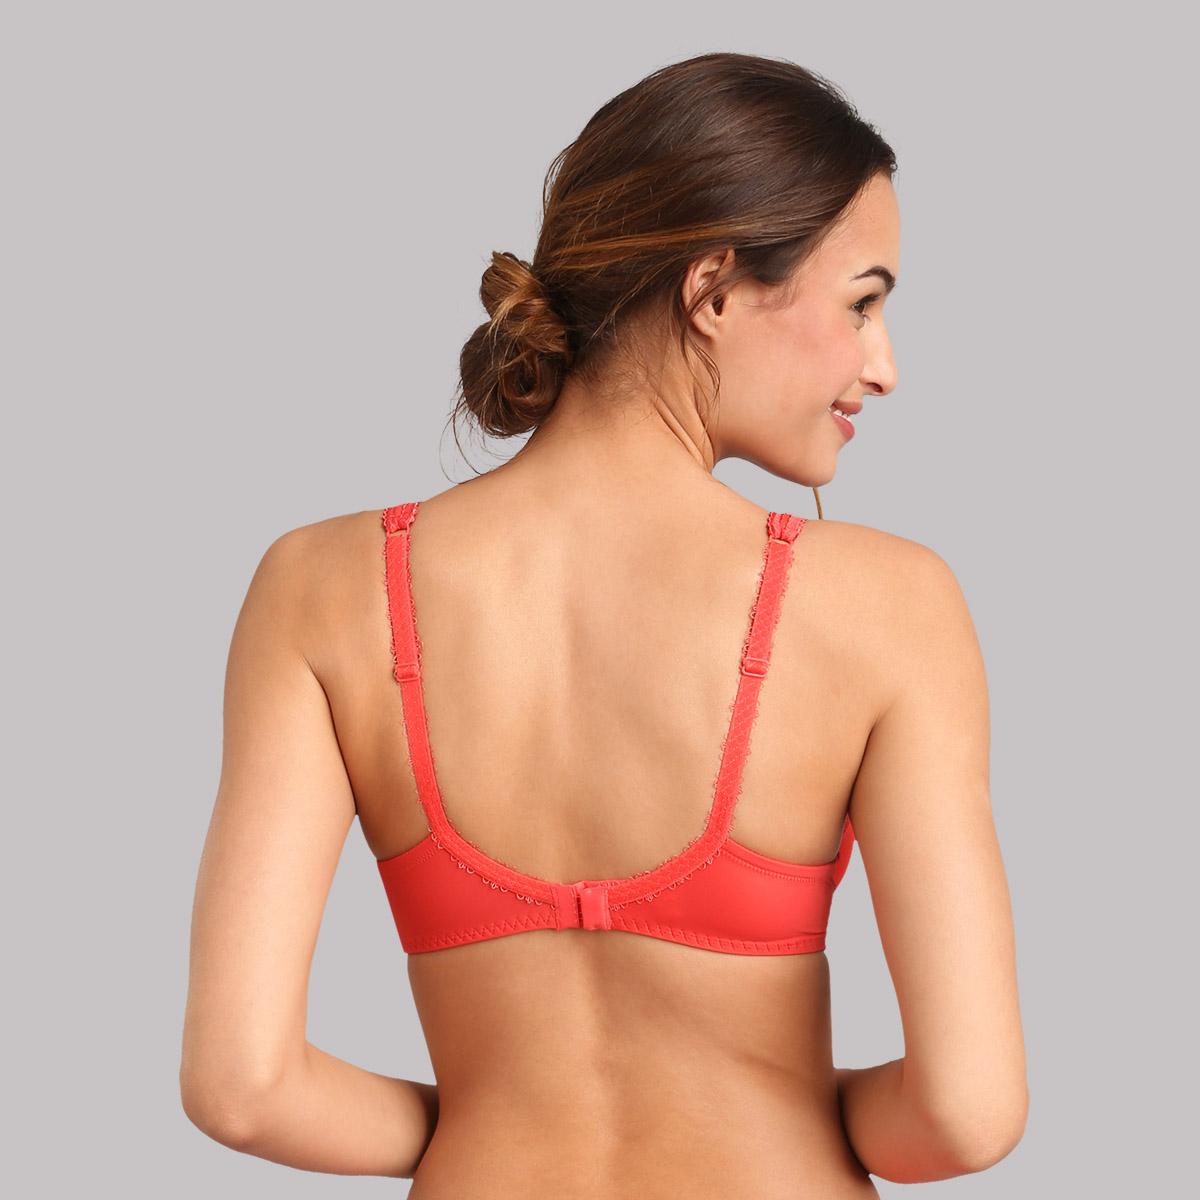 Underwired spacer bra in coral - Flower Elegance, , PLAYTEX